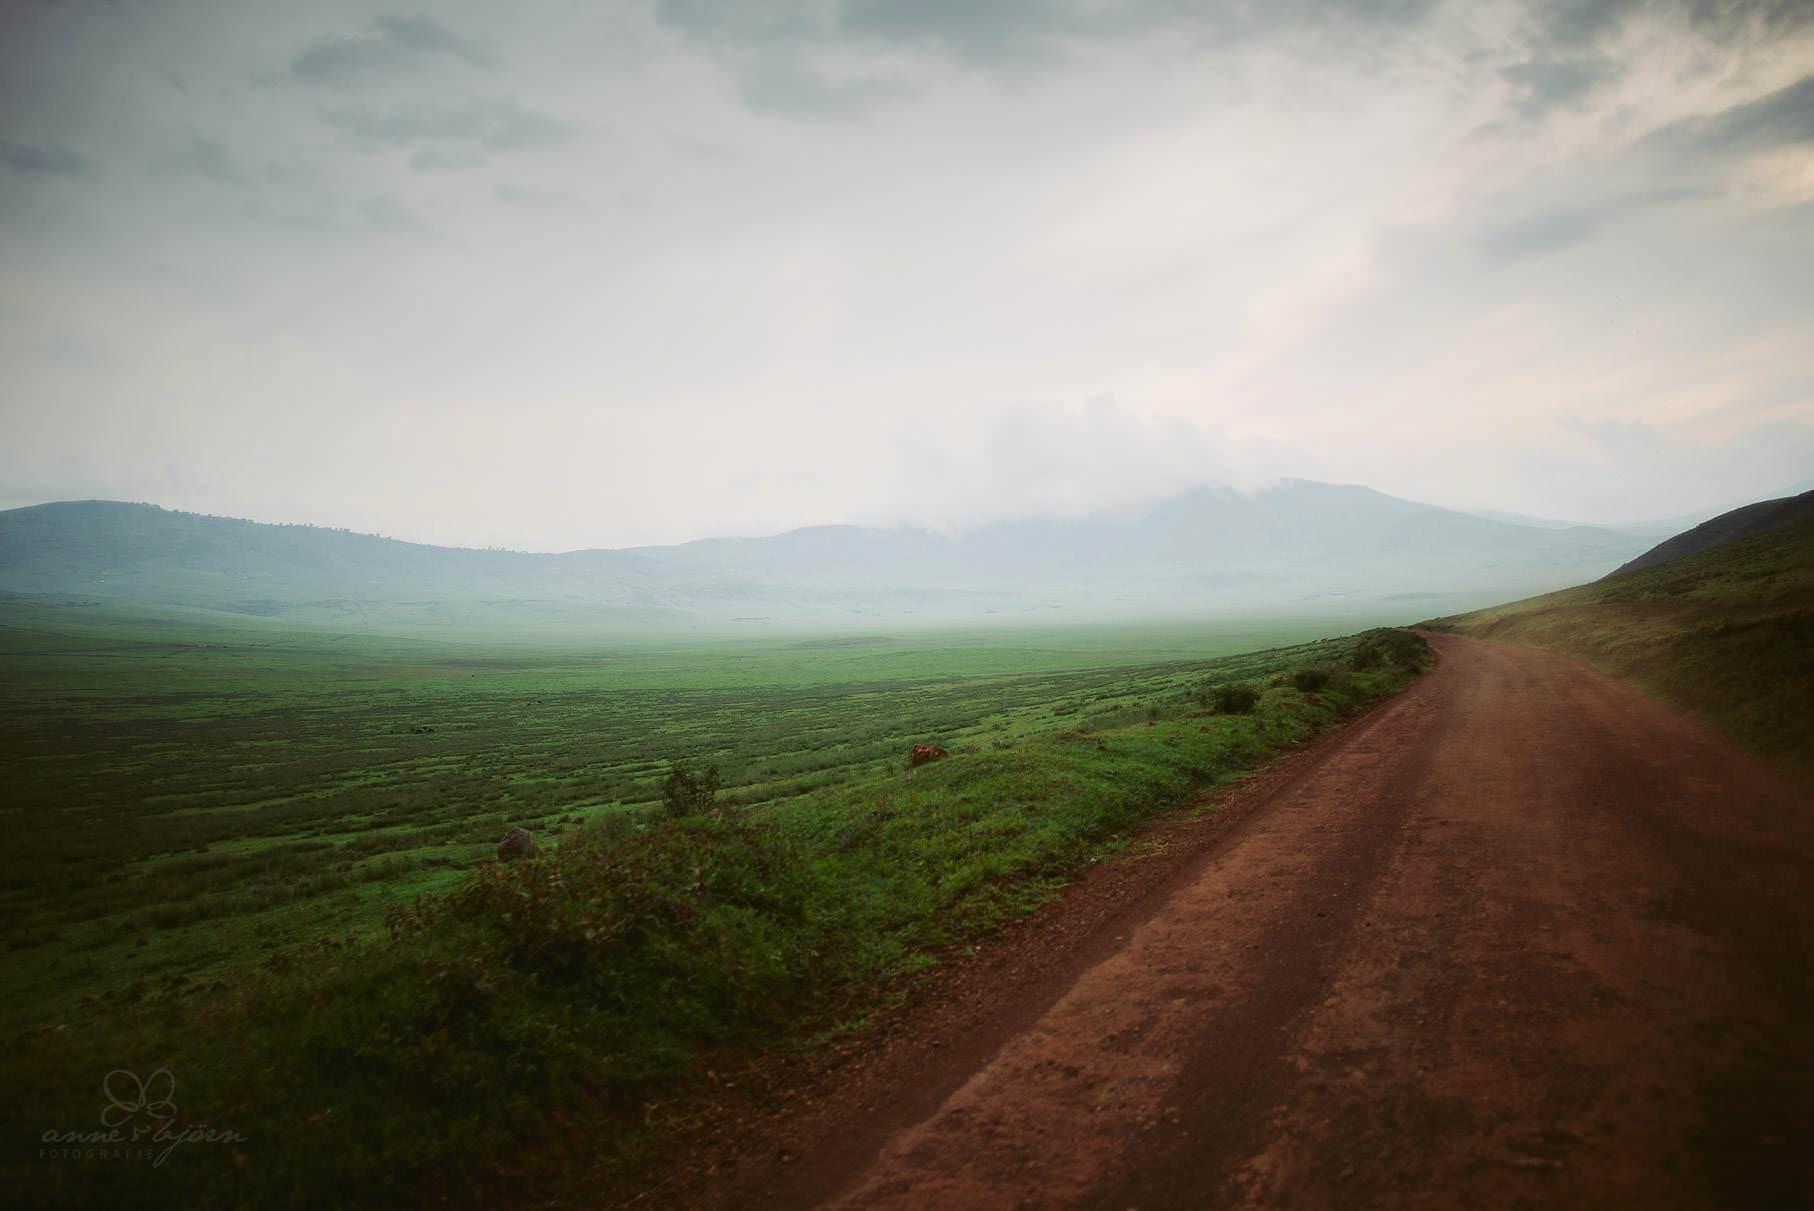 0044 tansania nd6 7672 anne bjoern fotografie hochzeitsfotograf hamburg - This is Tanzania - Serengeti, Kilimanjaro & Sansibar